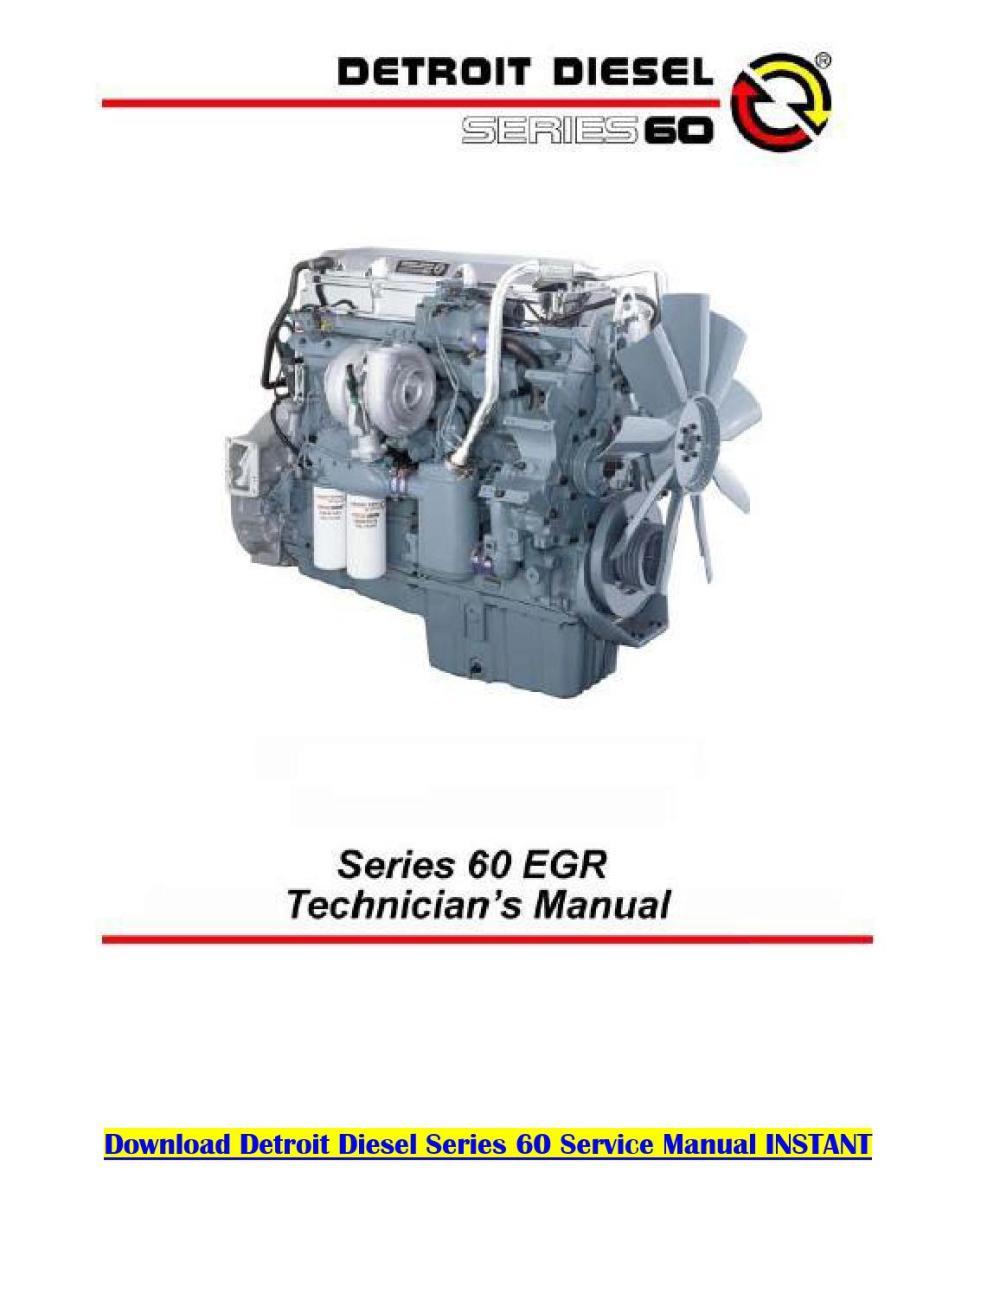 medium resolution of detroit diesel series 60 service manual pdf